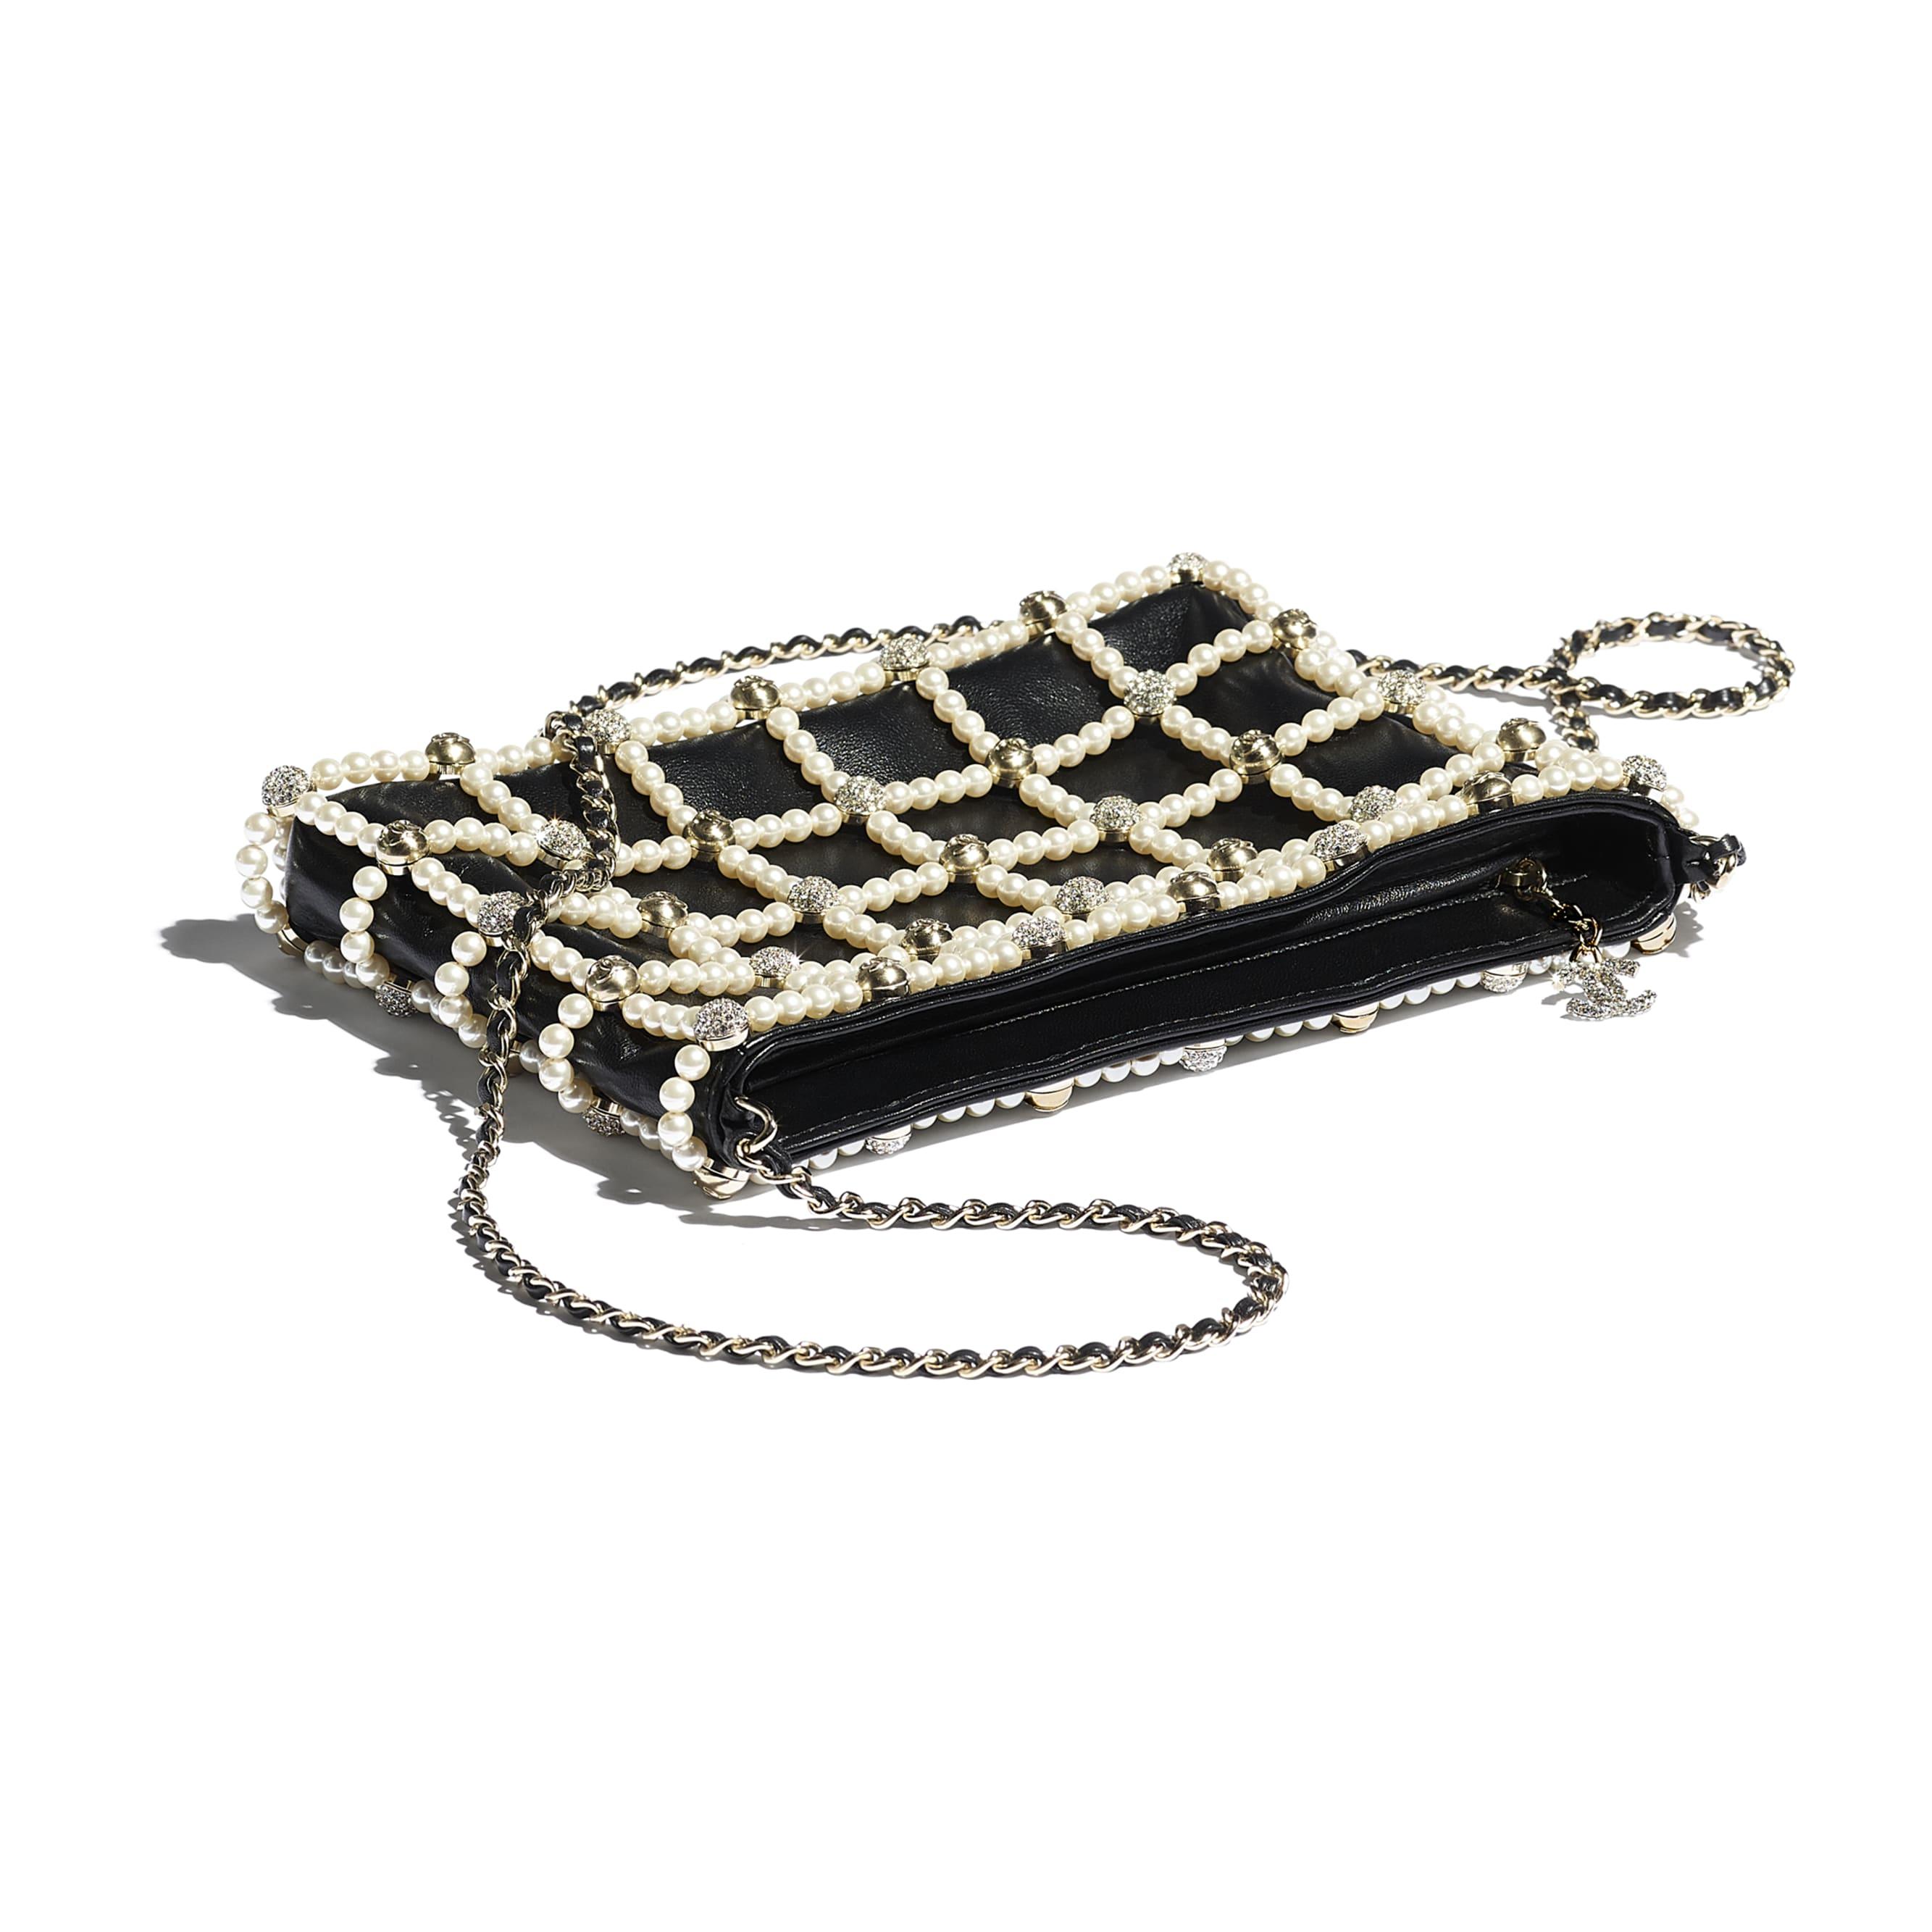 Clutch - Black - Lambskin, Calfskin, Glass Pearls, Strass & Gold-Tone Metal - CHANEL - Outra vista - ver a versão em tamanho standard